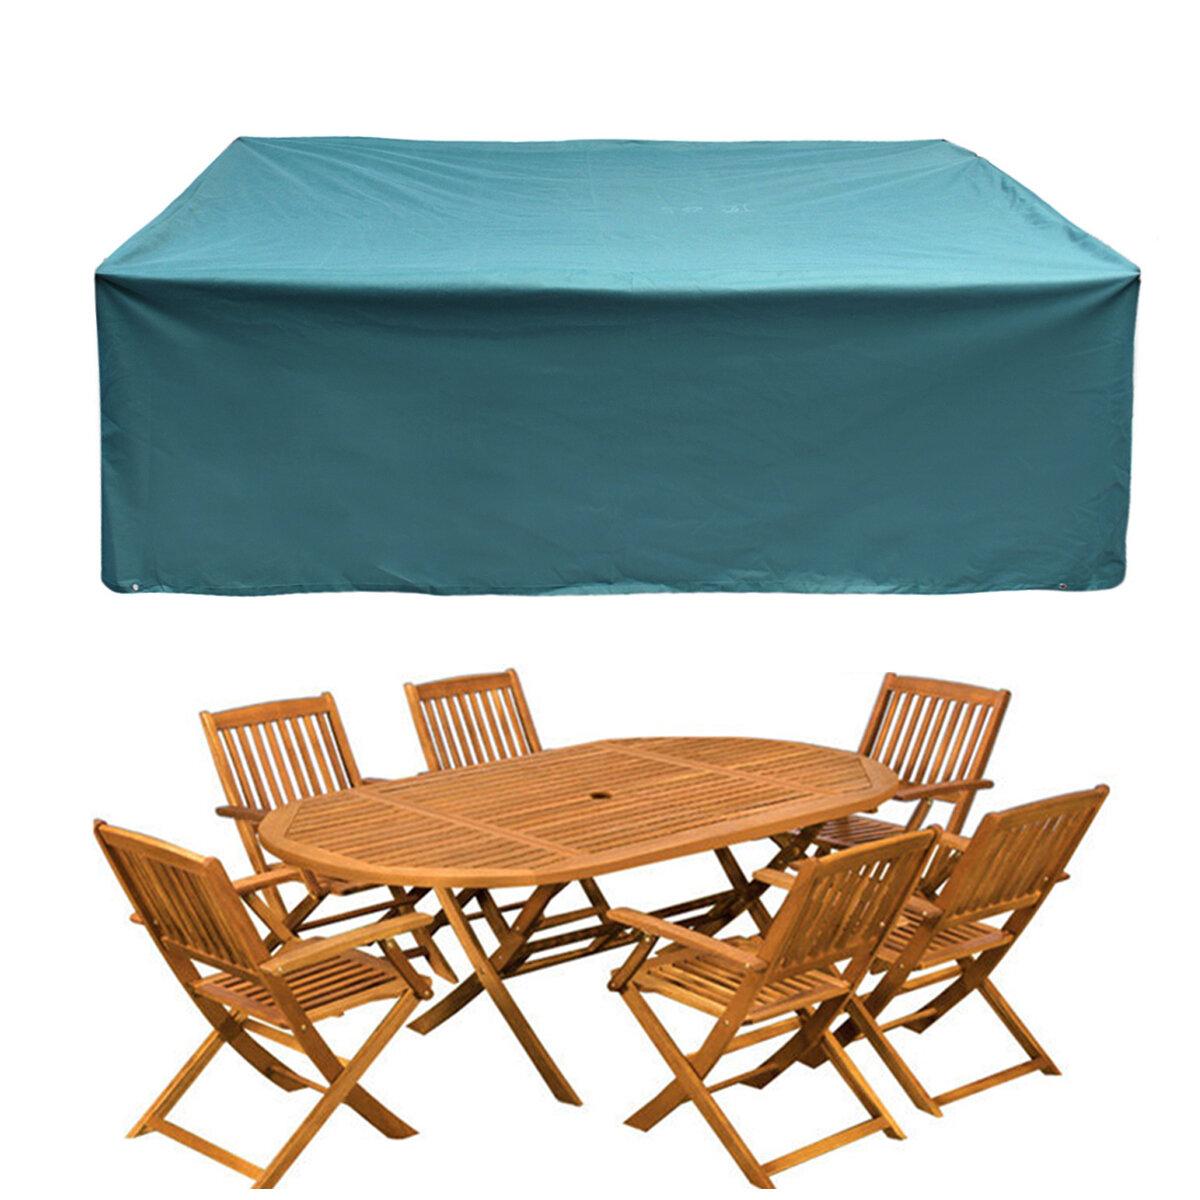 Rainproof Patio Furniture.Outdoor Furniture Waterproof Cover Patio Garden Rattan Swing Chair Uv Sun Rain Dust Protector